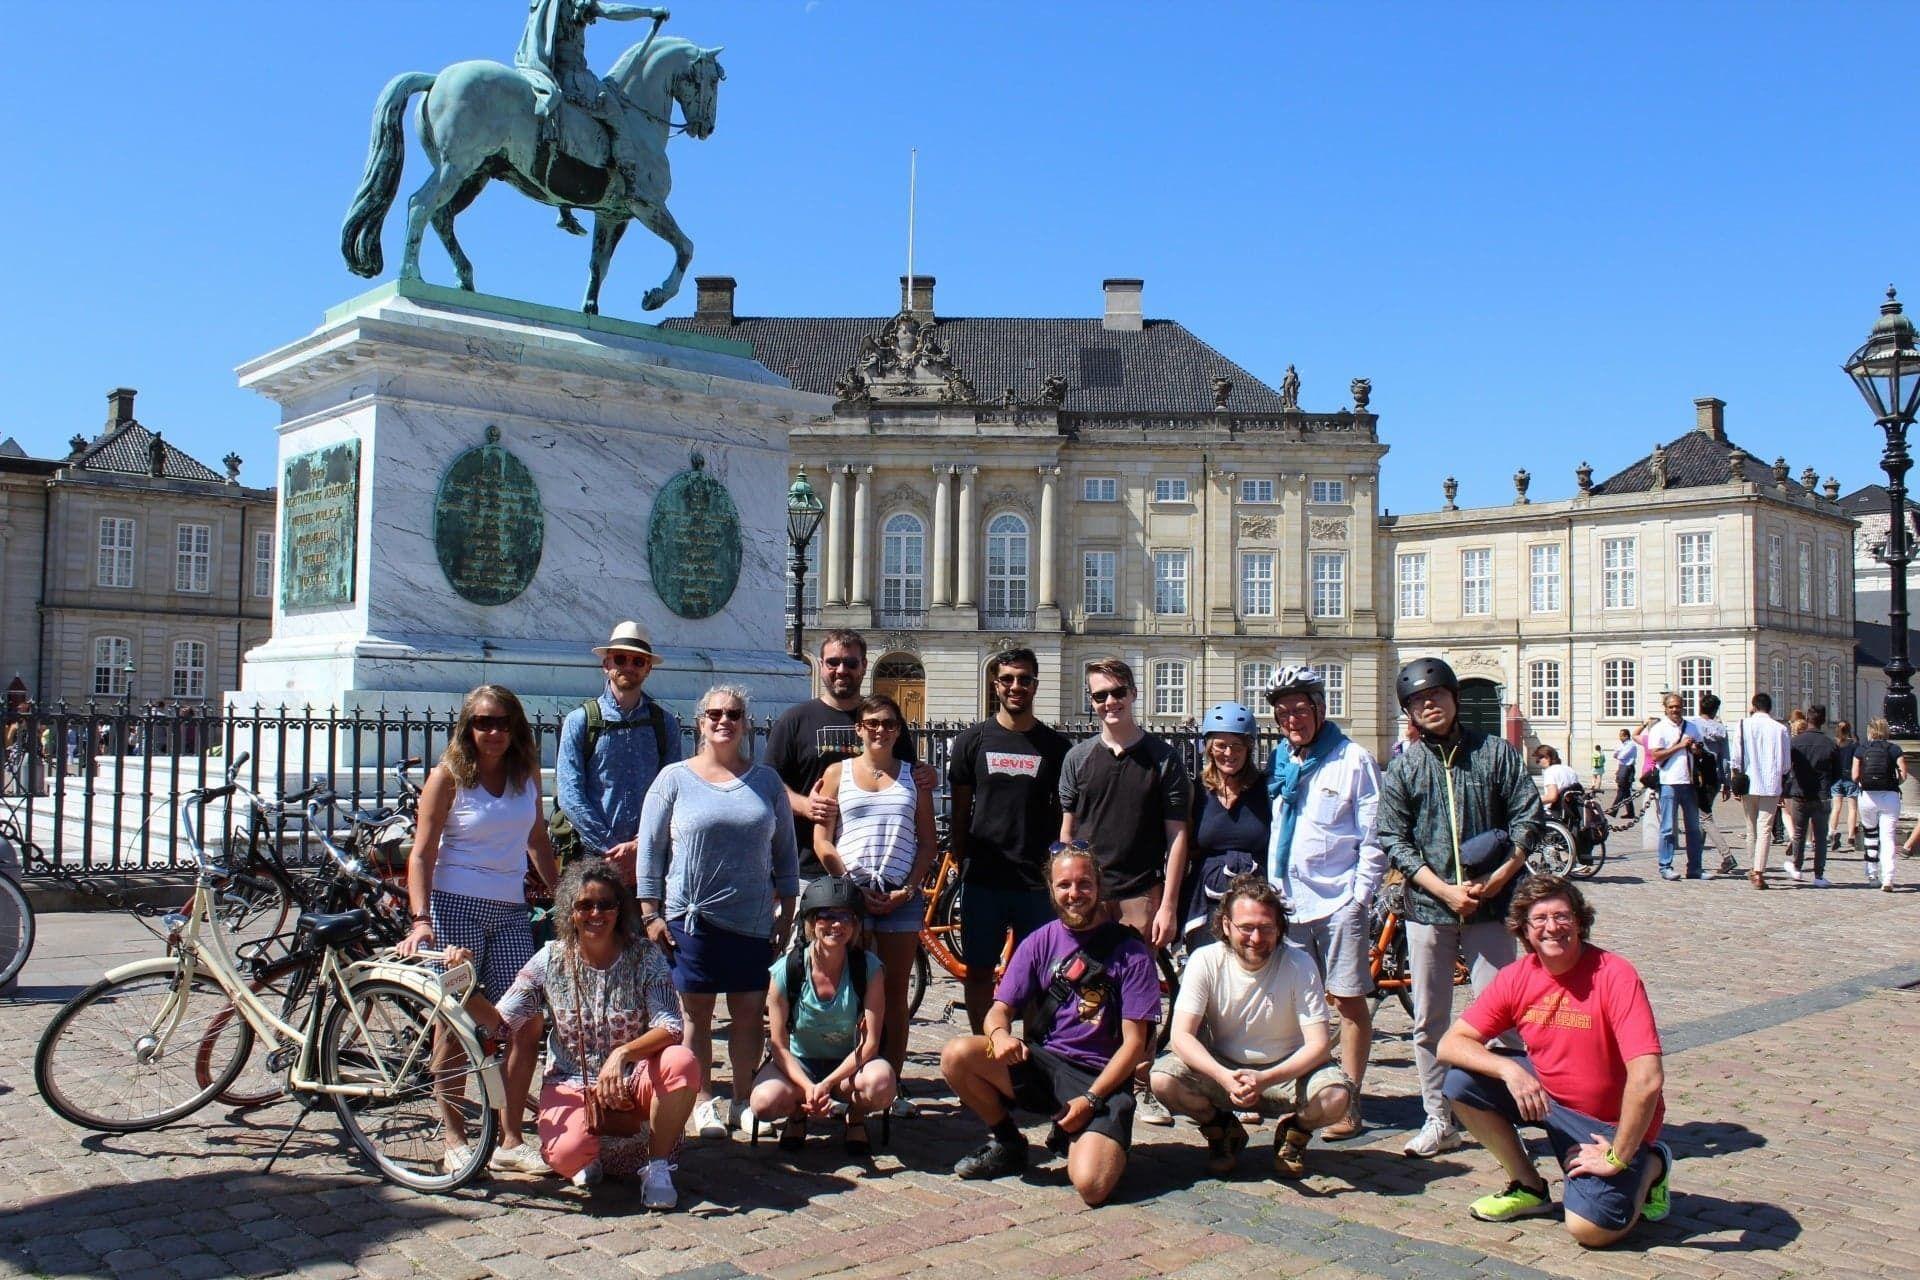 Bike tour in Amalienborg